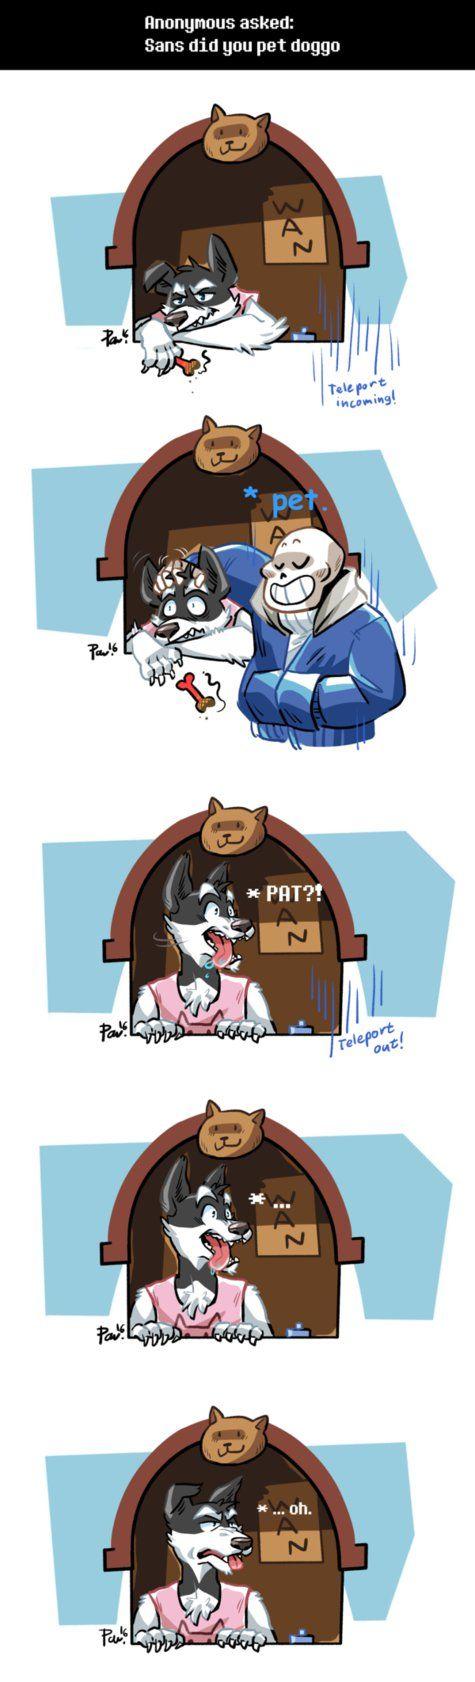 Undertale ask blog: Doggo by bPAVLICA on DeviantArt